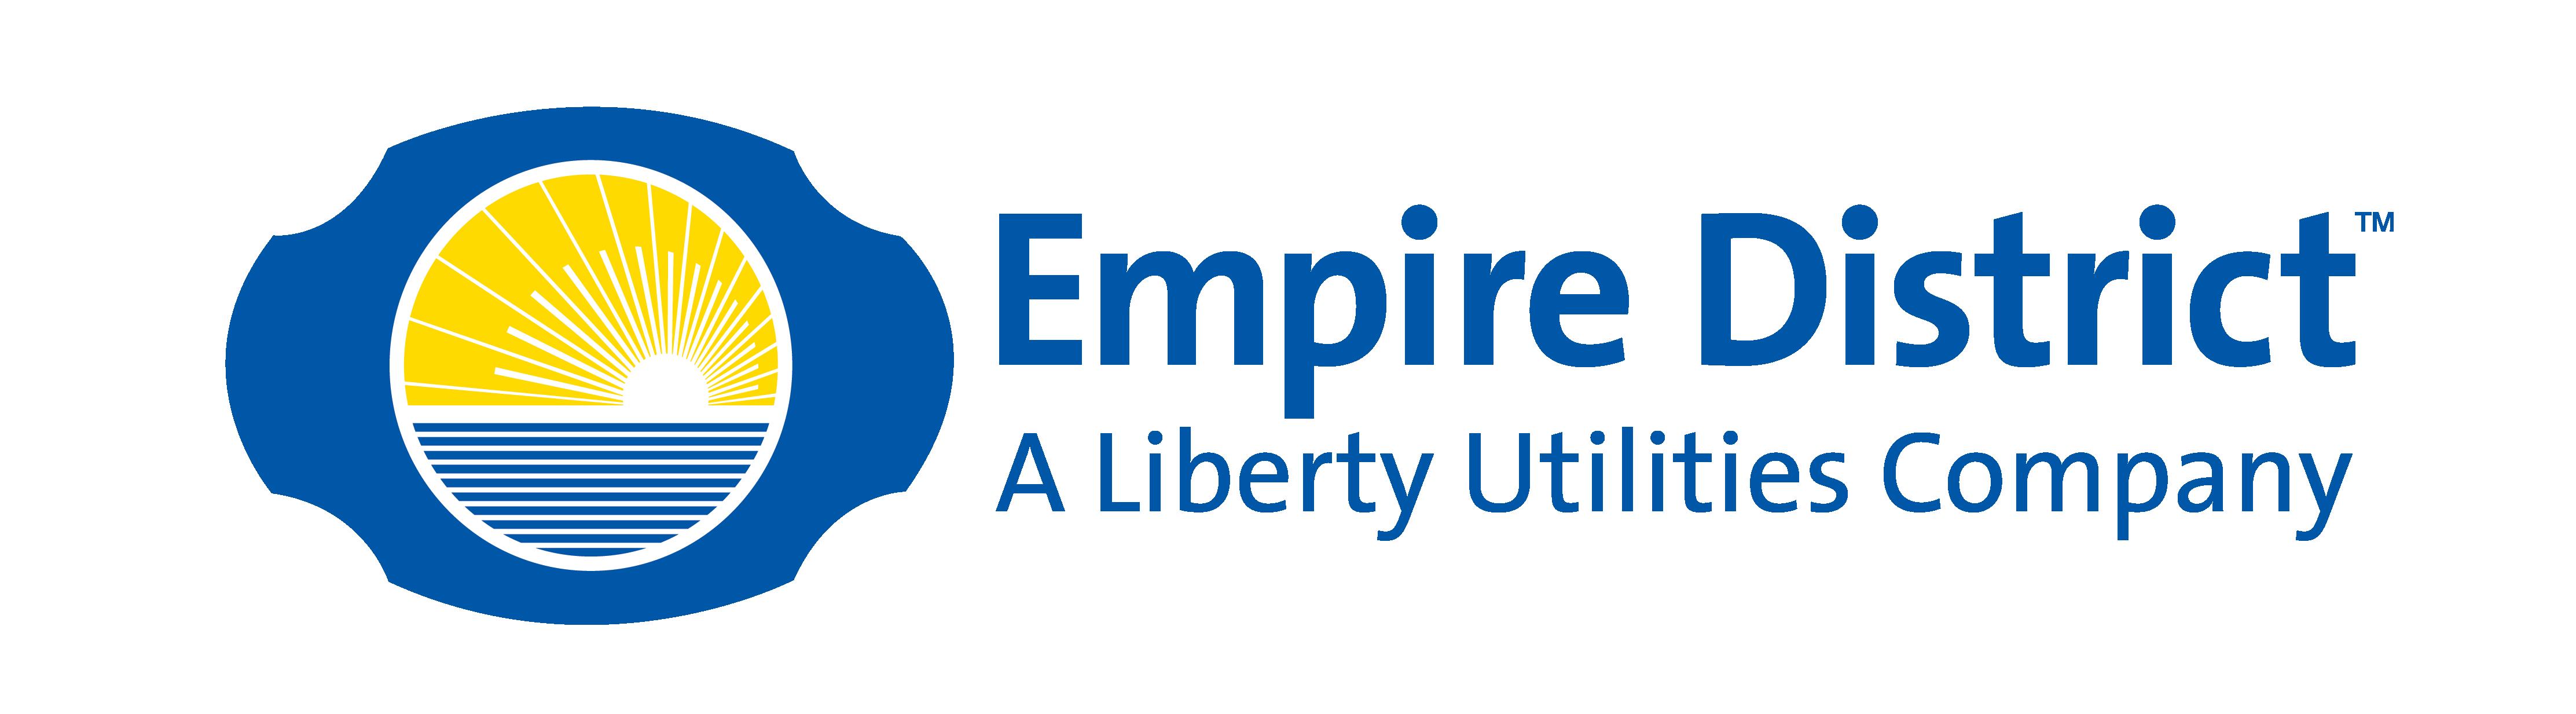 Empire District Electric Company logo